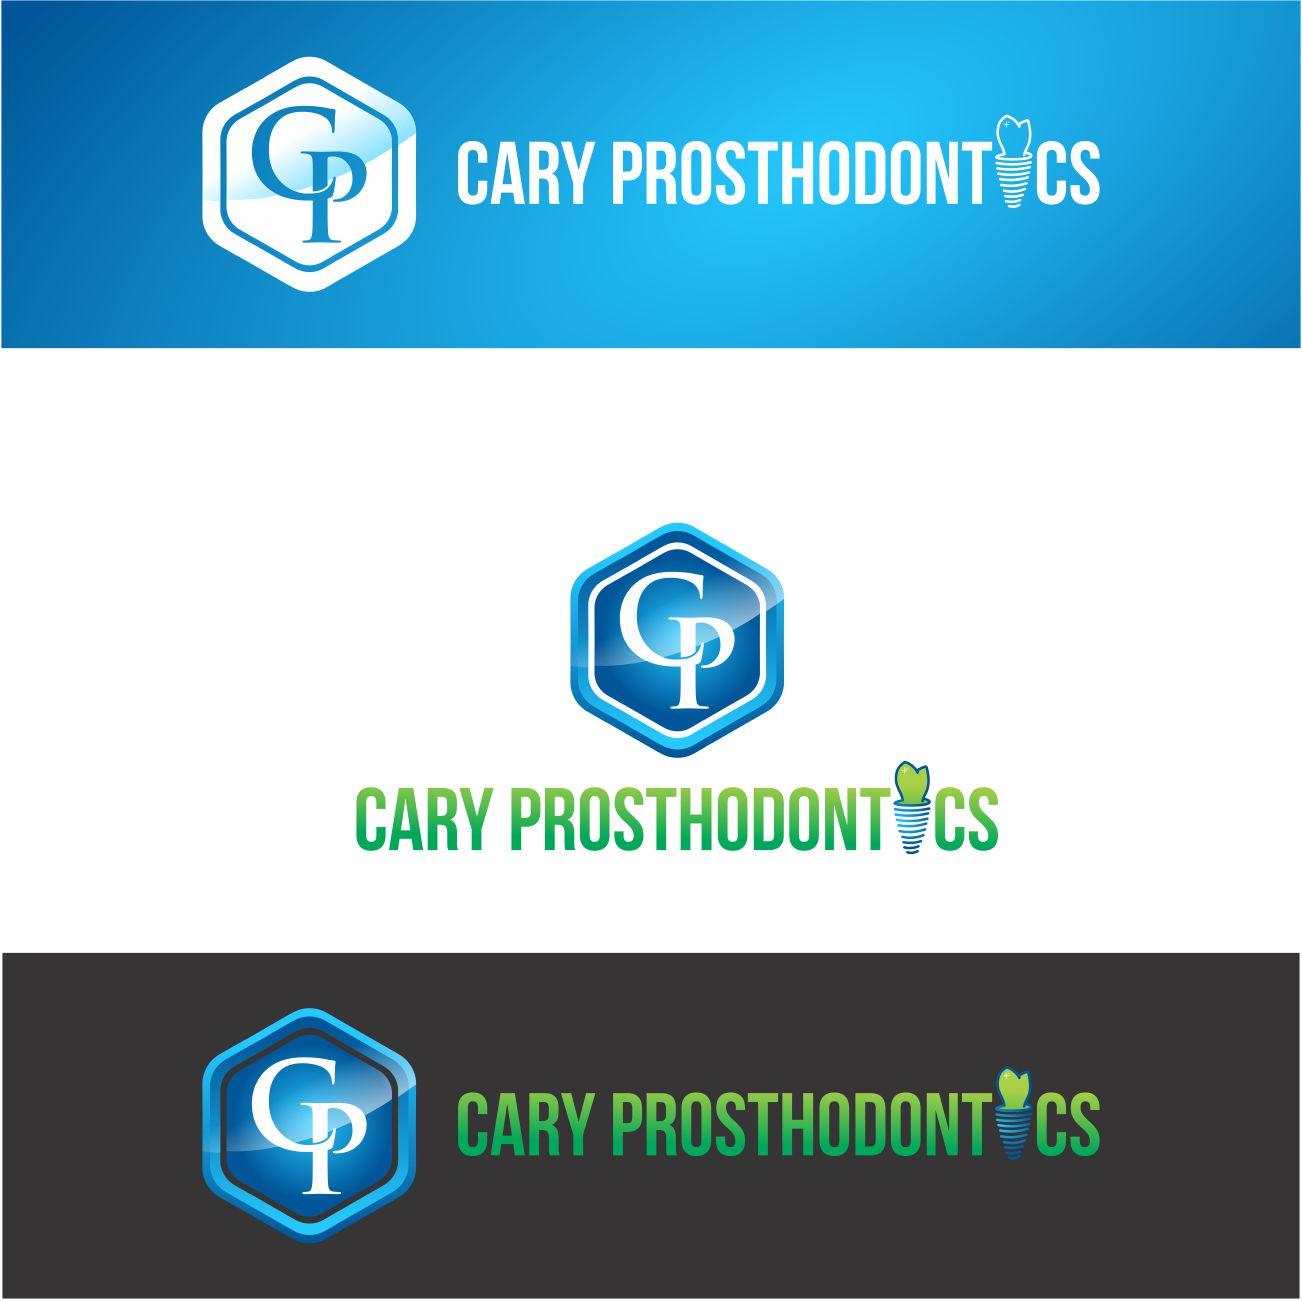 Logo Design by RasYa Muhammad Athaya - Entry No. 173 in the Logo Design Contest Cary Prosthodontics Logo Design.